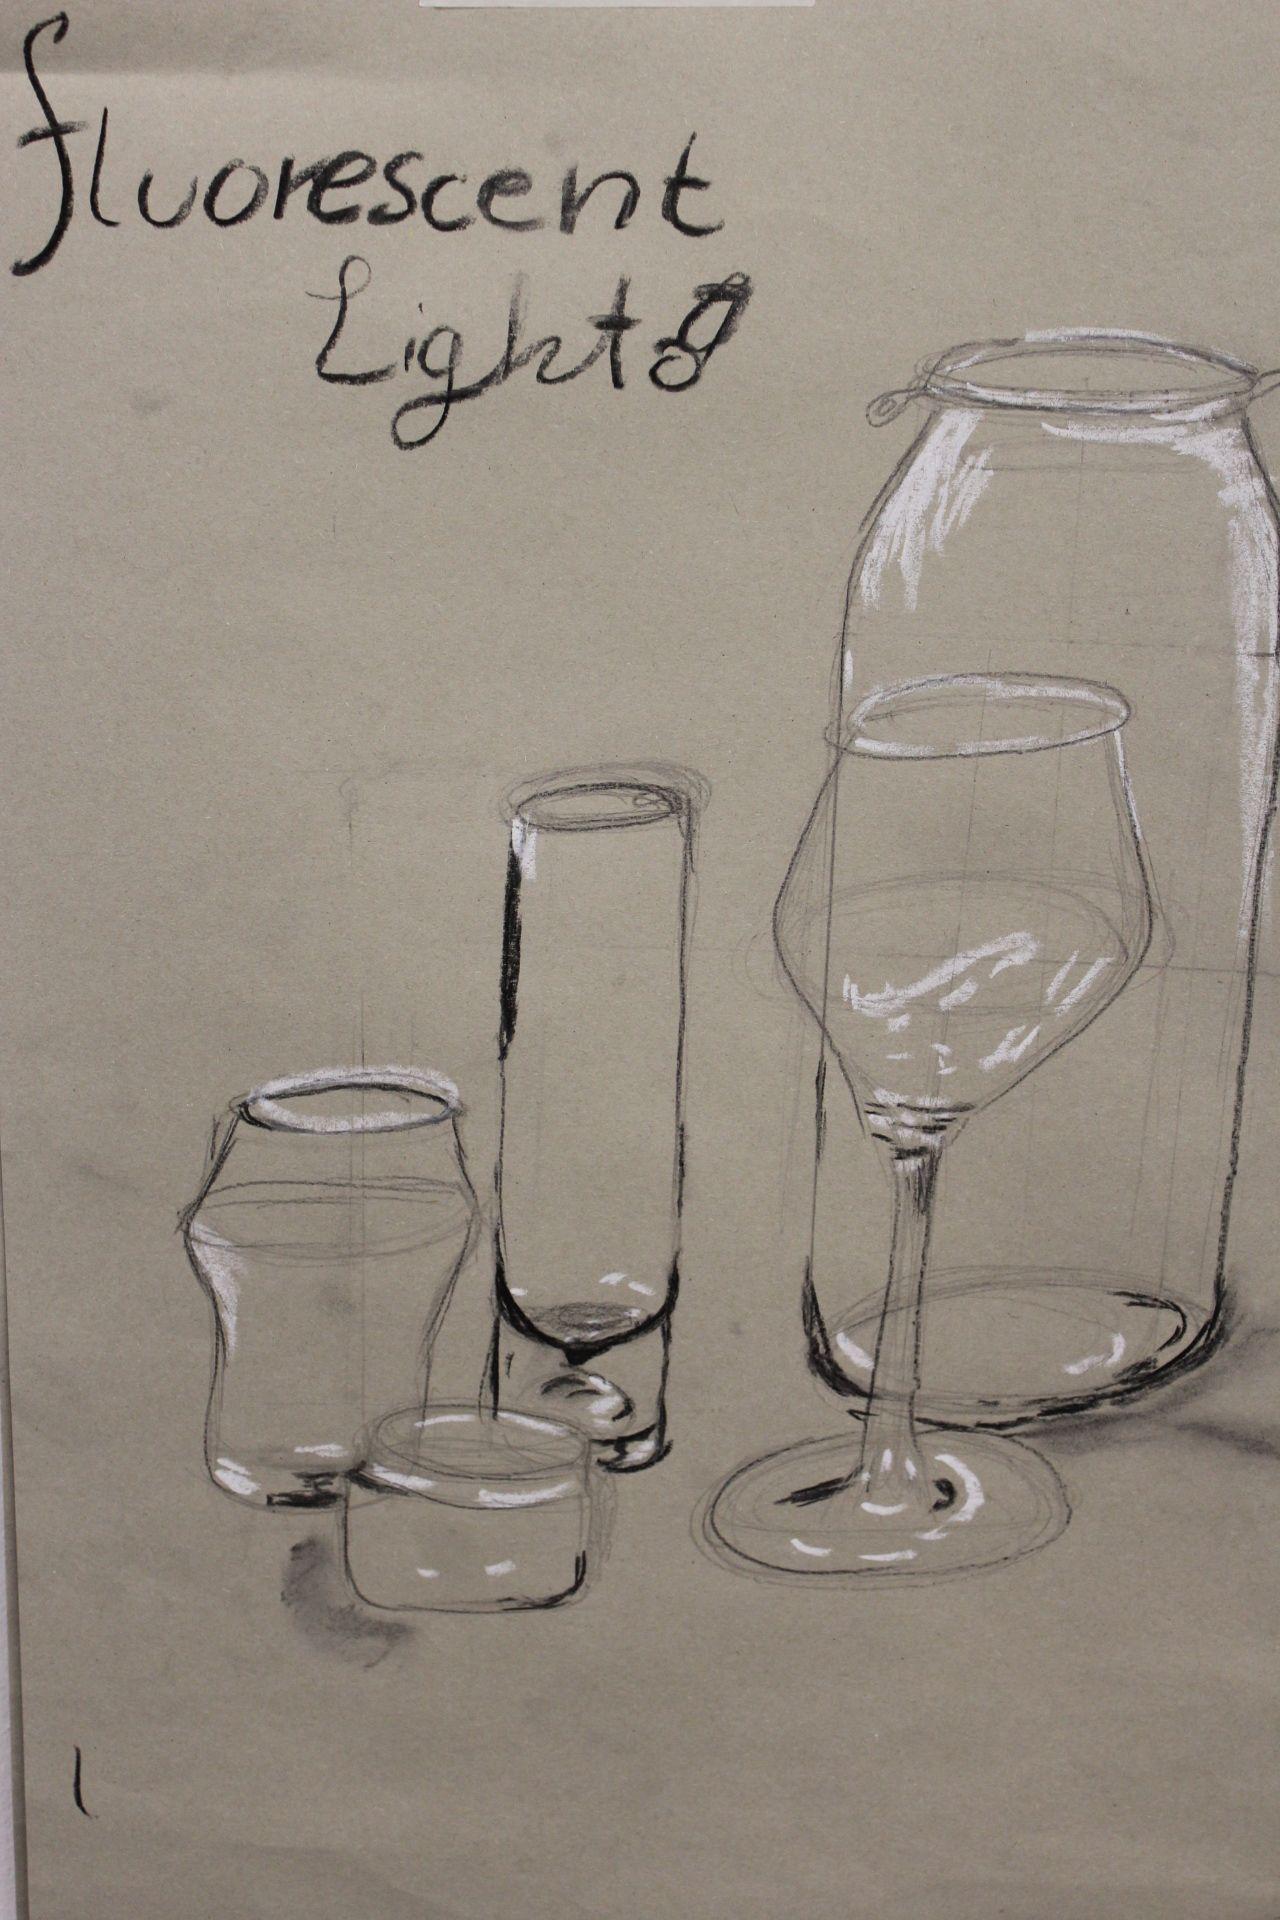 Drawing Bottles With Fluorescent Light Bottles Drawing Fluorescent Light In 2020 Fluorescent Light How To Make Light Glass